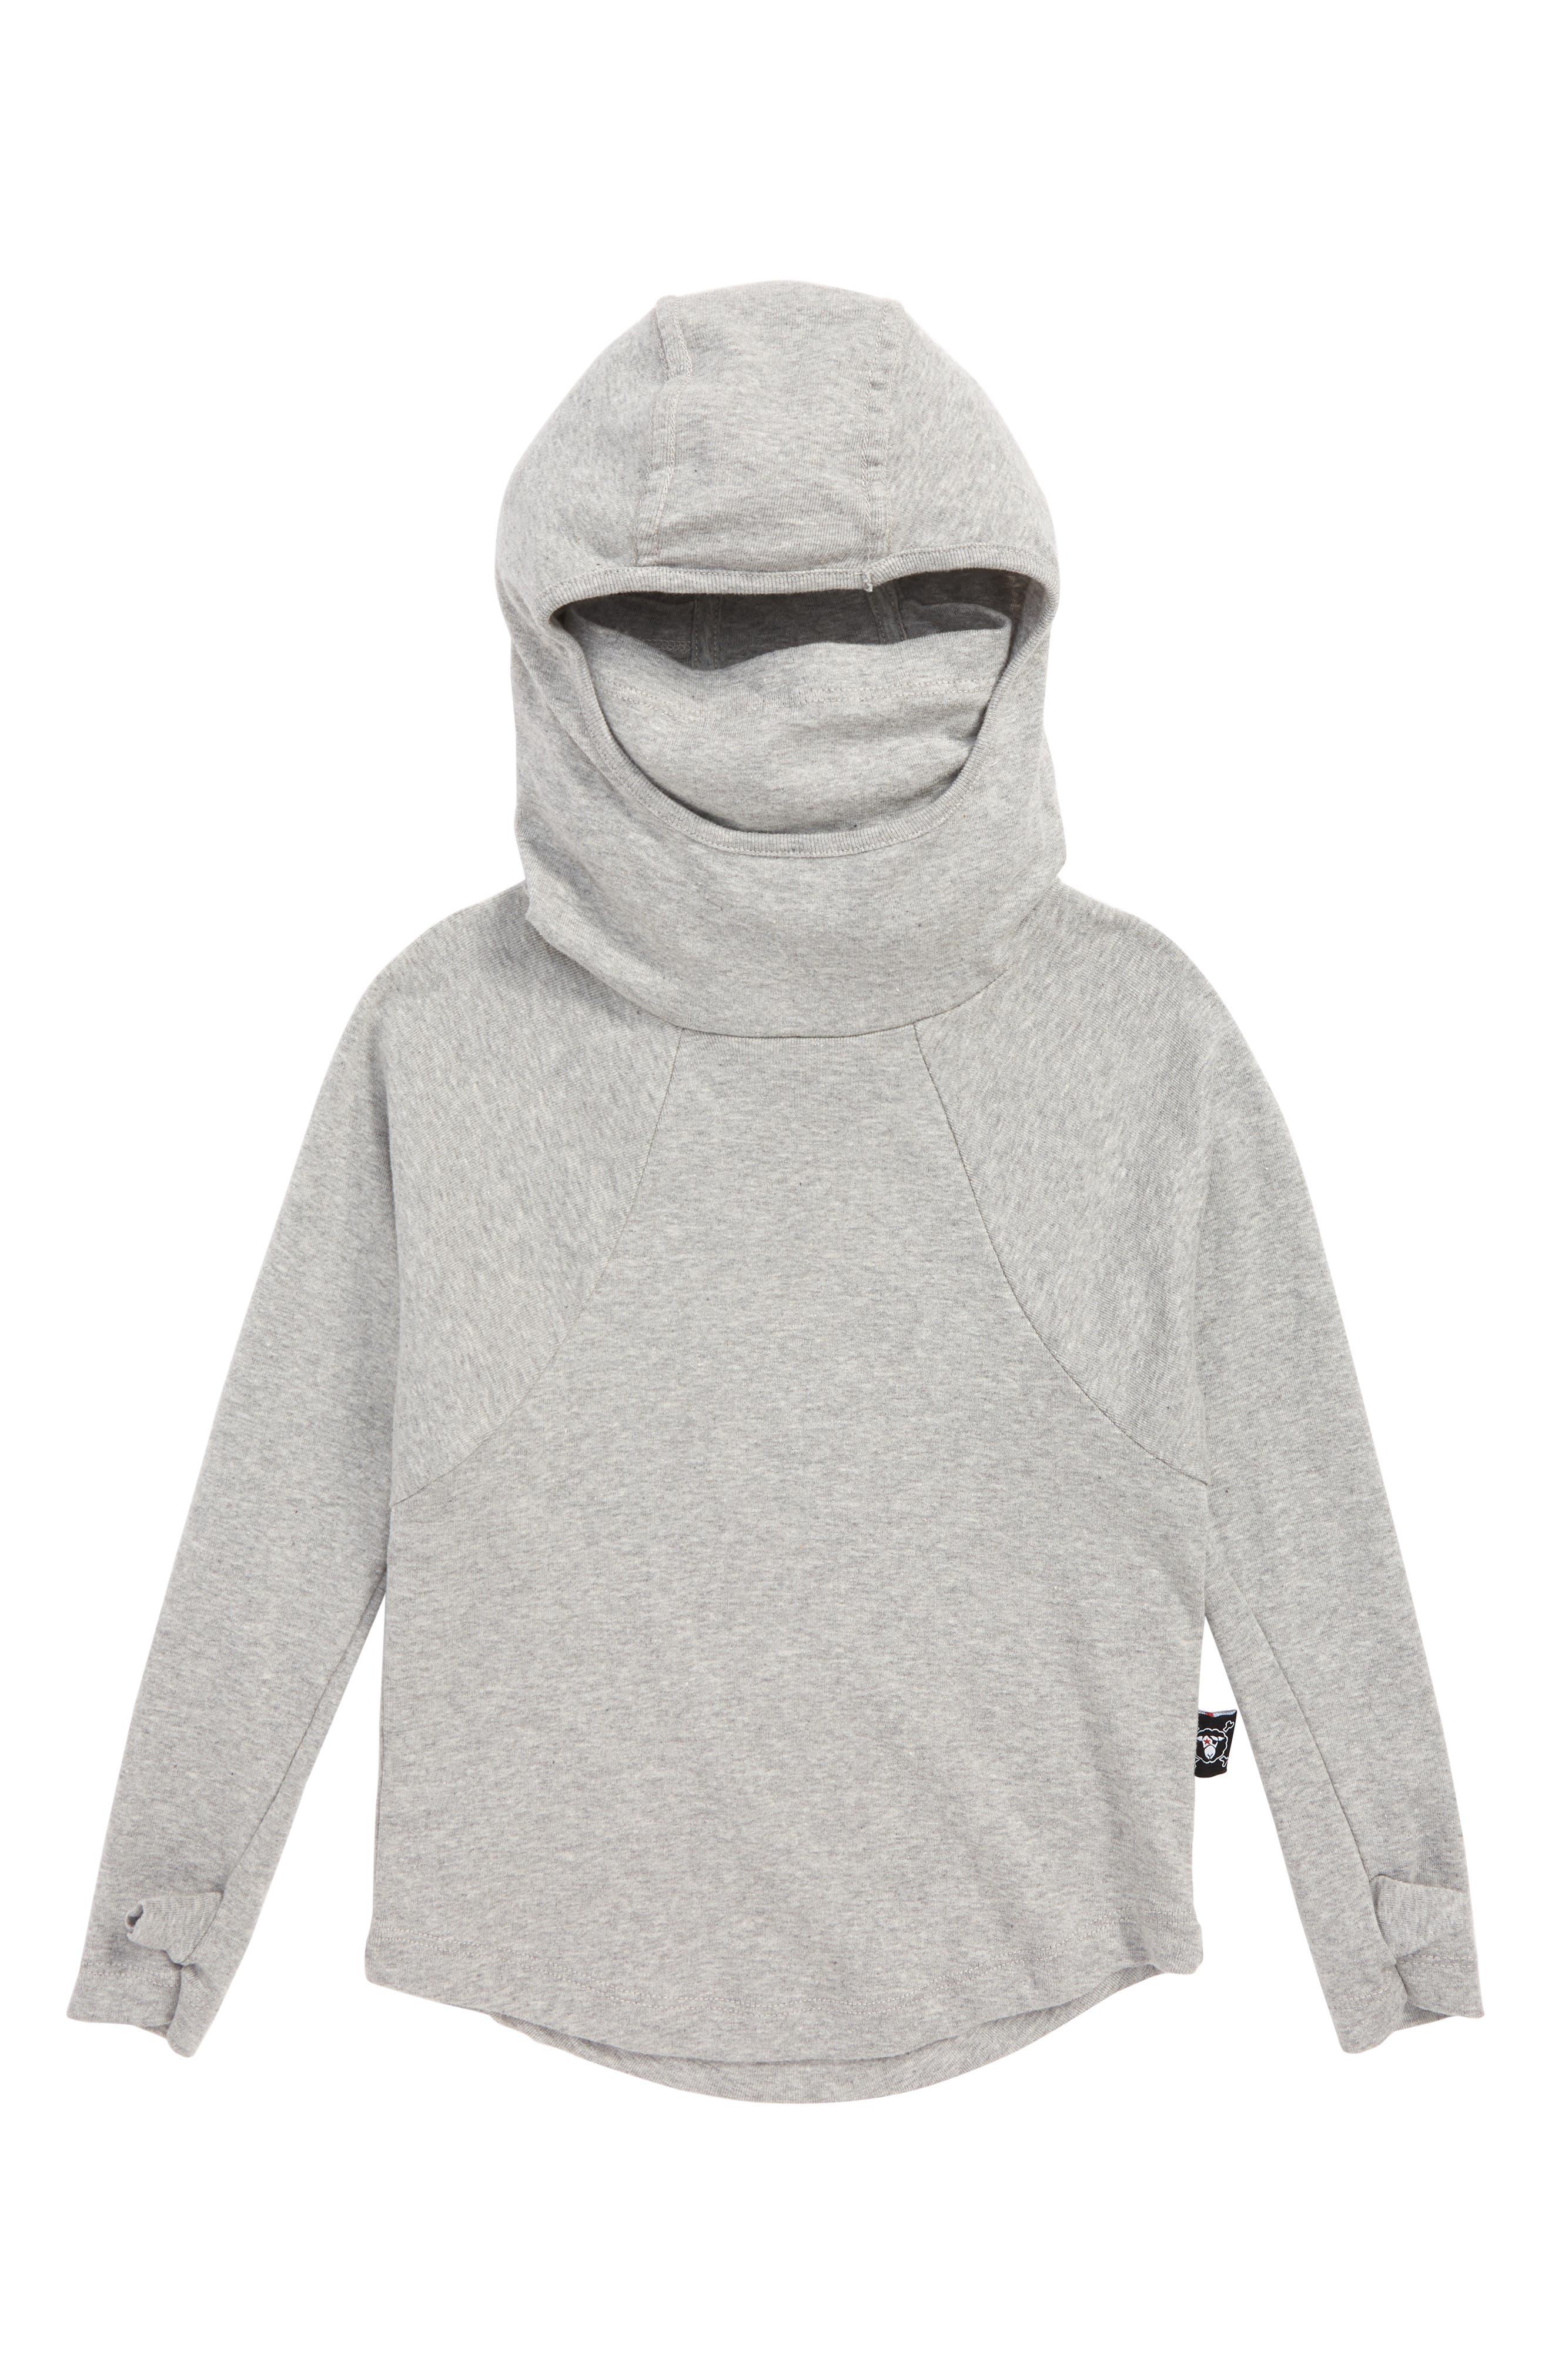 Ninja Hooded Shirt,                             Main thumbnail 1, color,                             HEATHER GREY